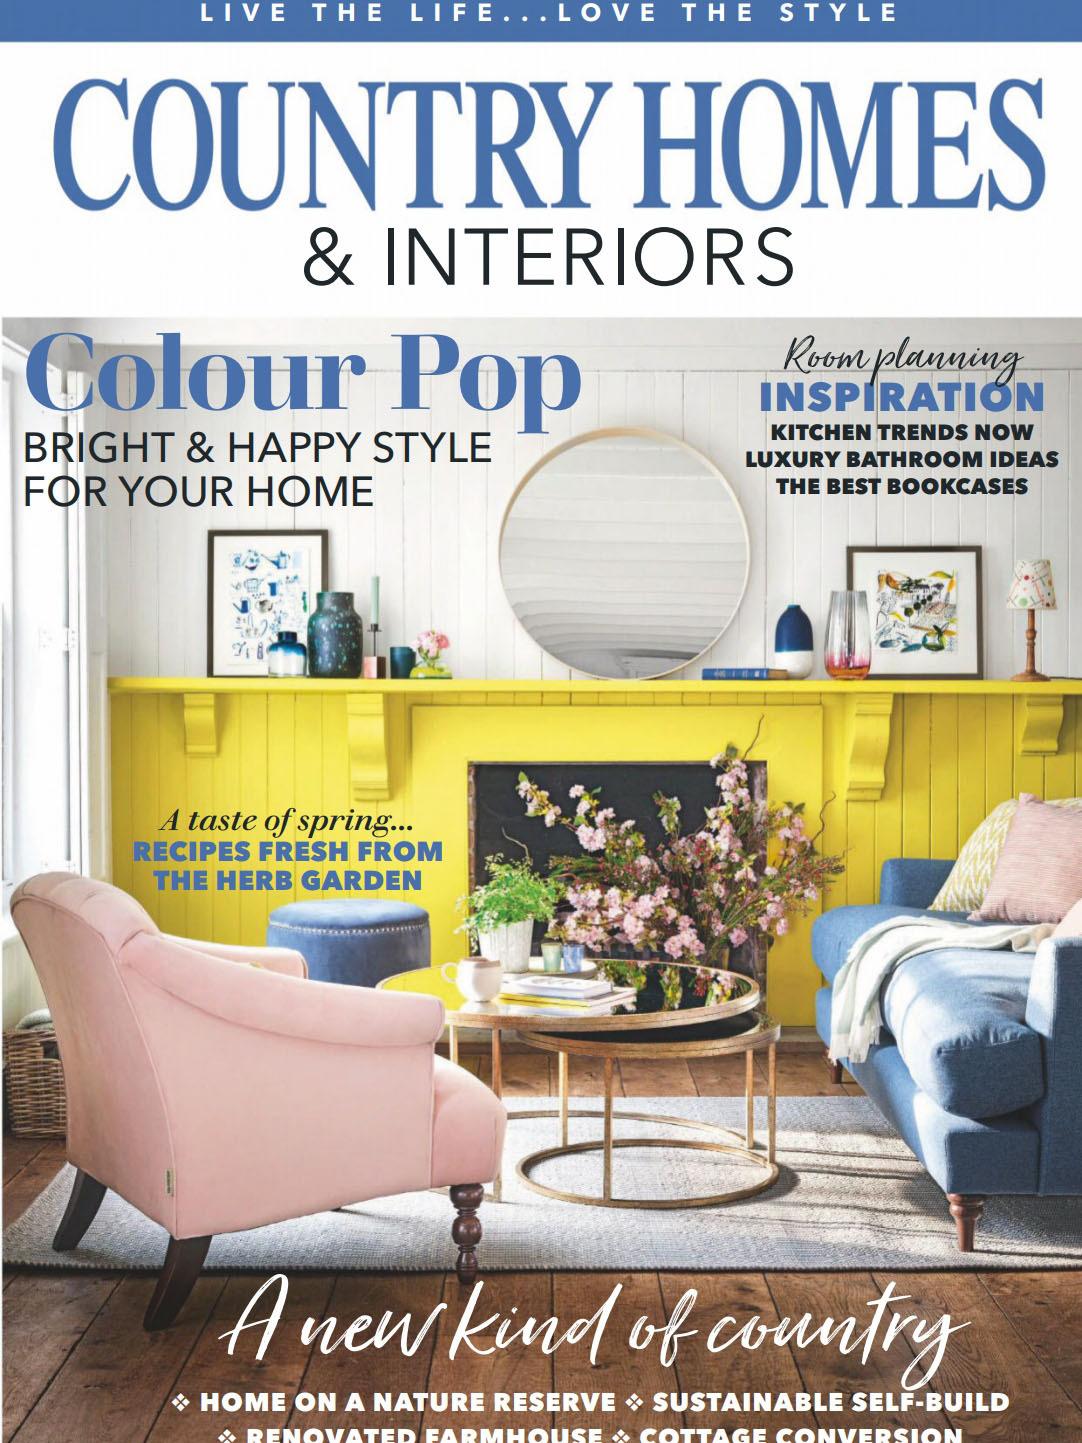 《Country Homes & Interiors》英国家居装饰杂志2020年03月号